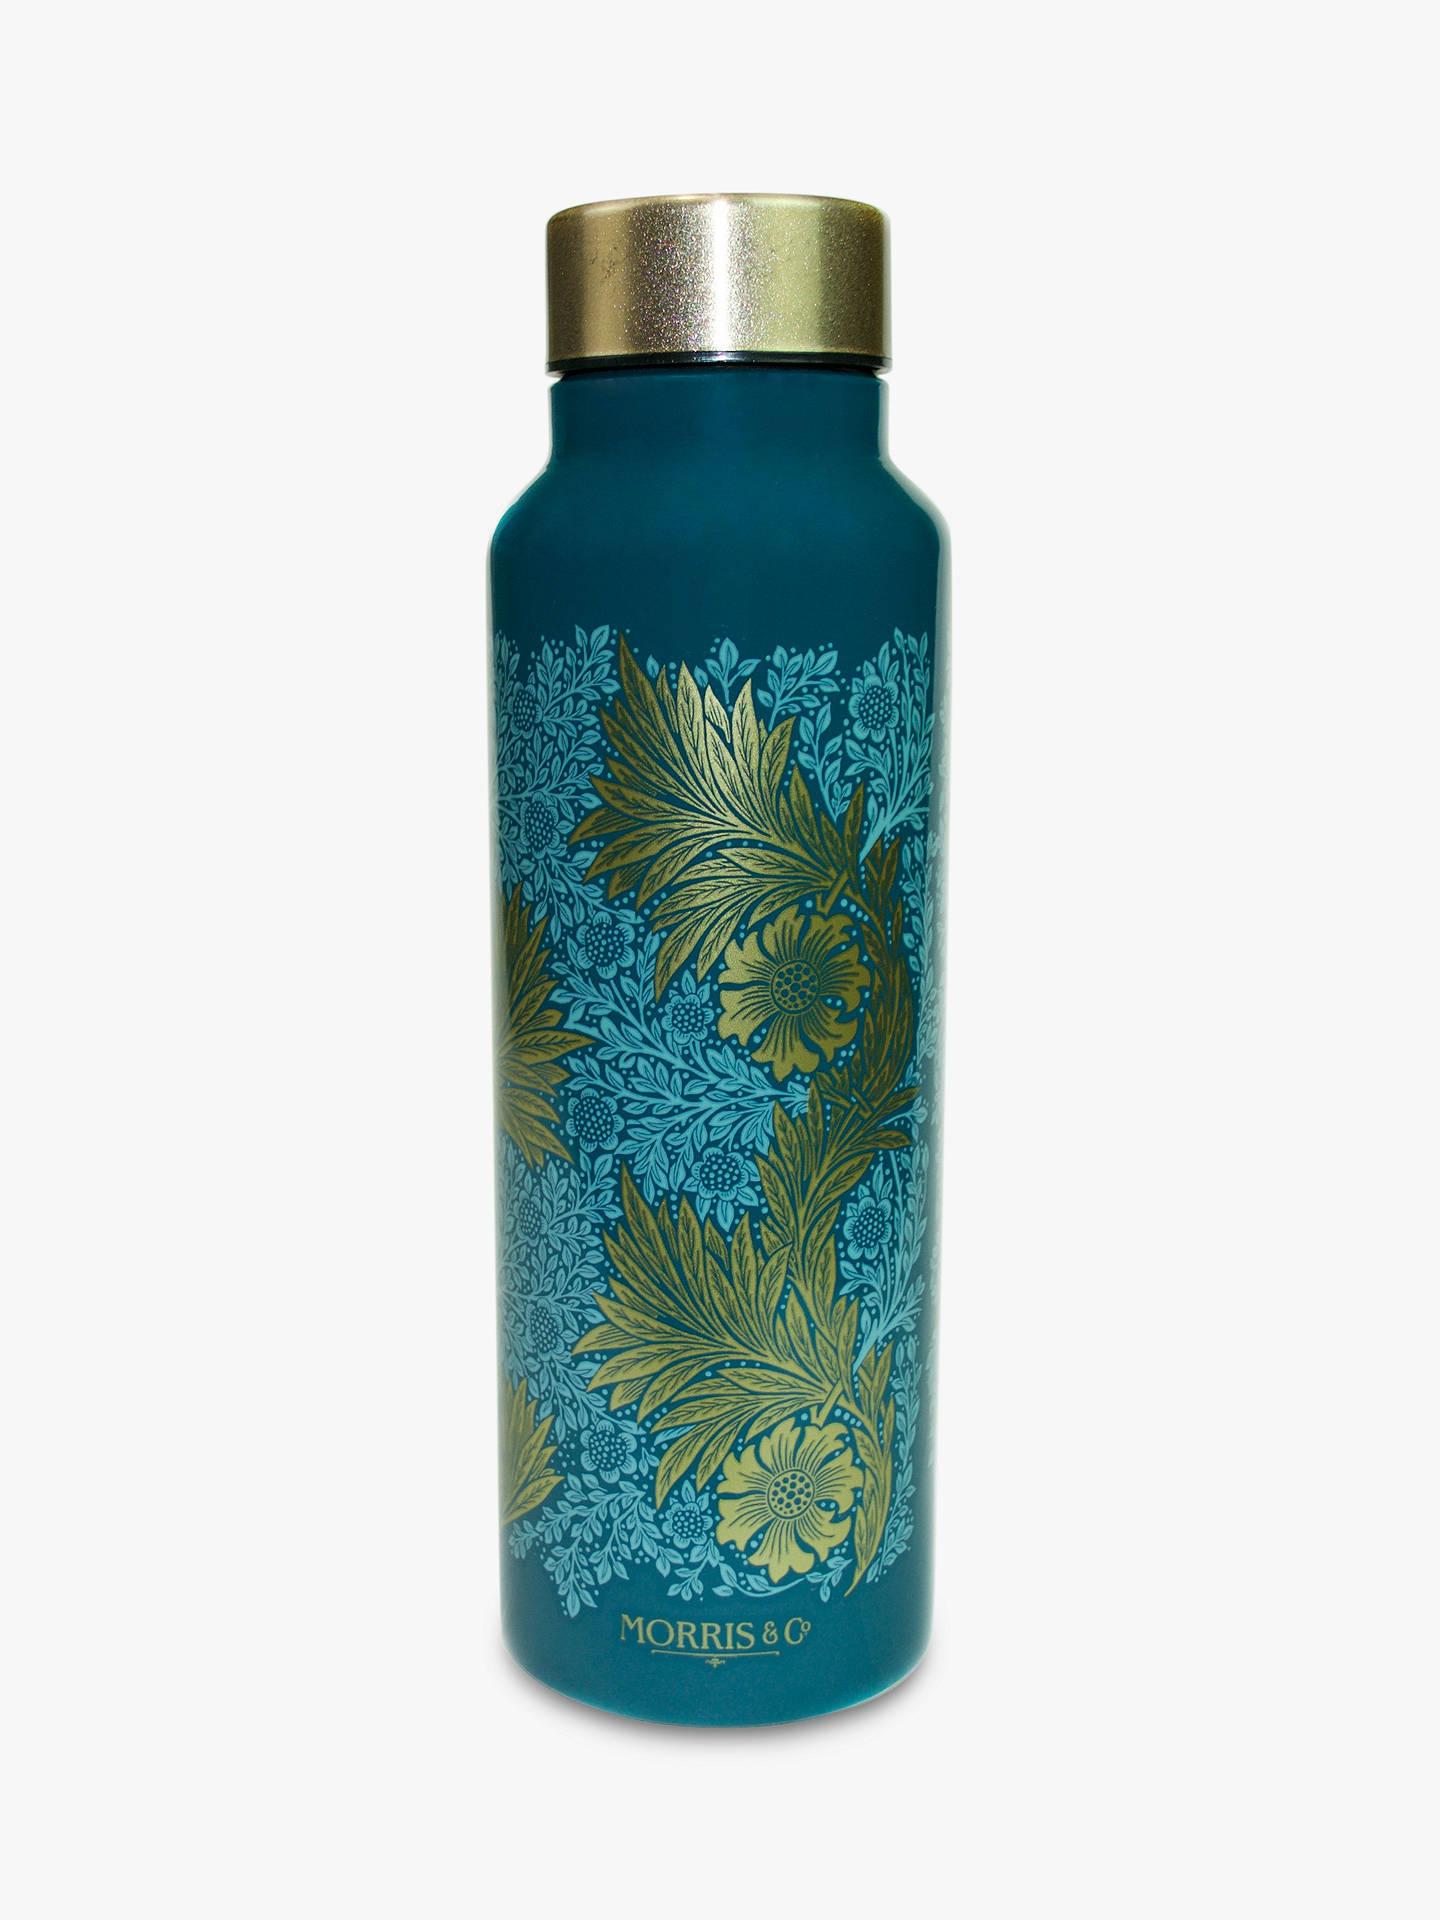 Buy Morris & Co. Marigold Drinks Bottle, 750ml Online at johnlewis.com